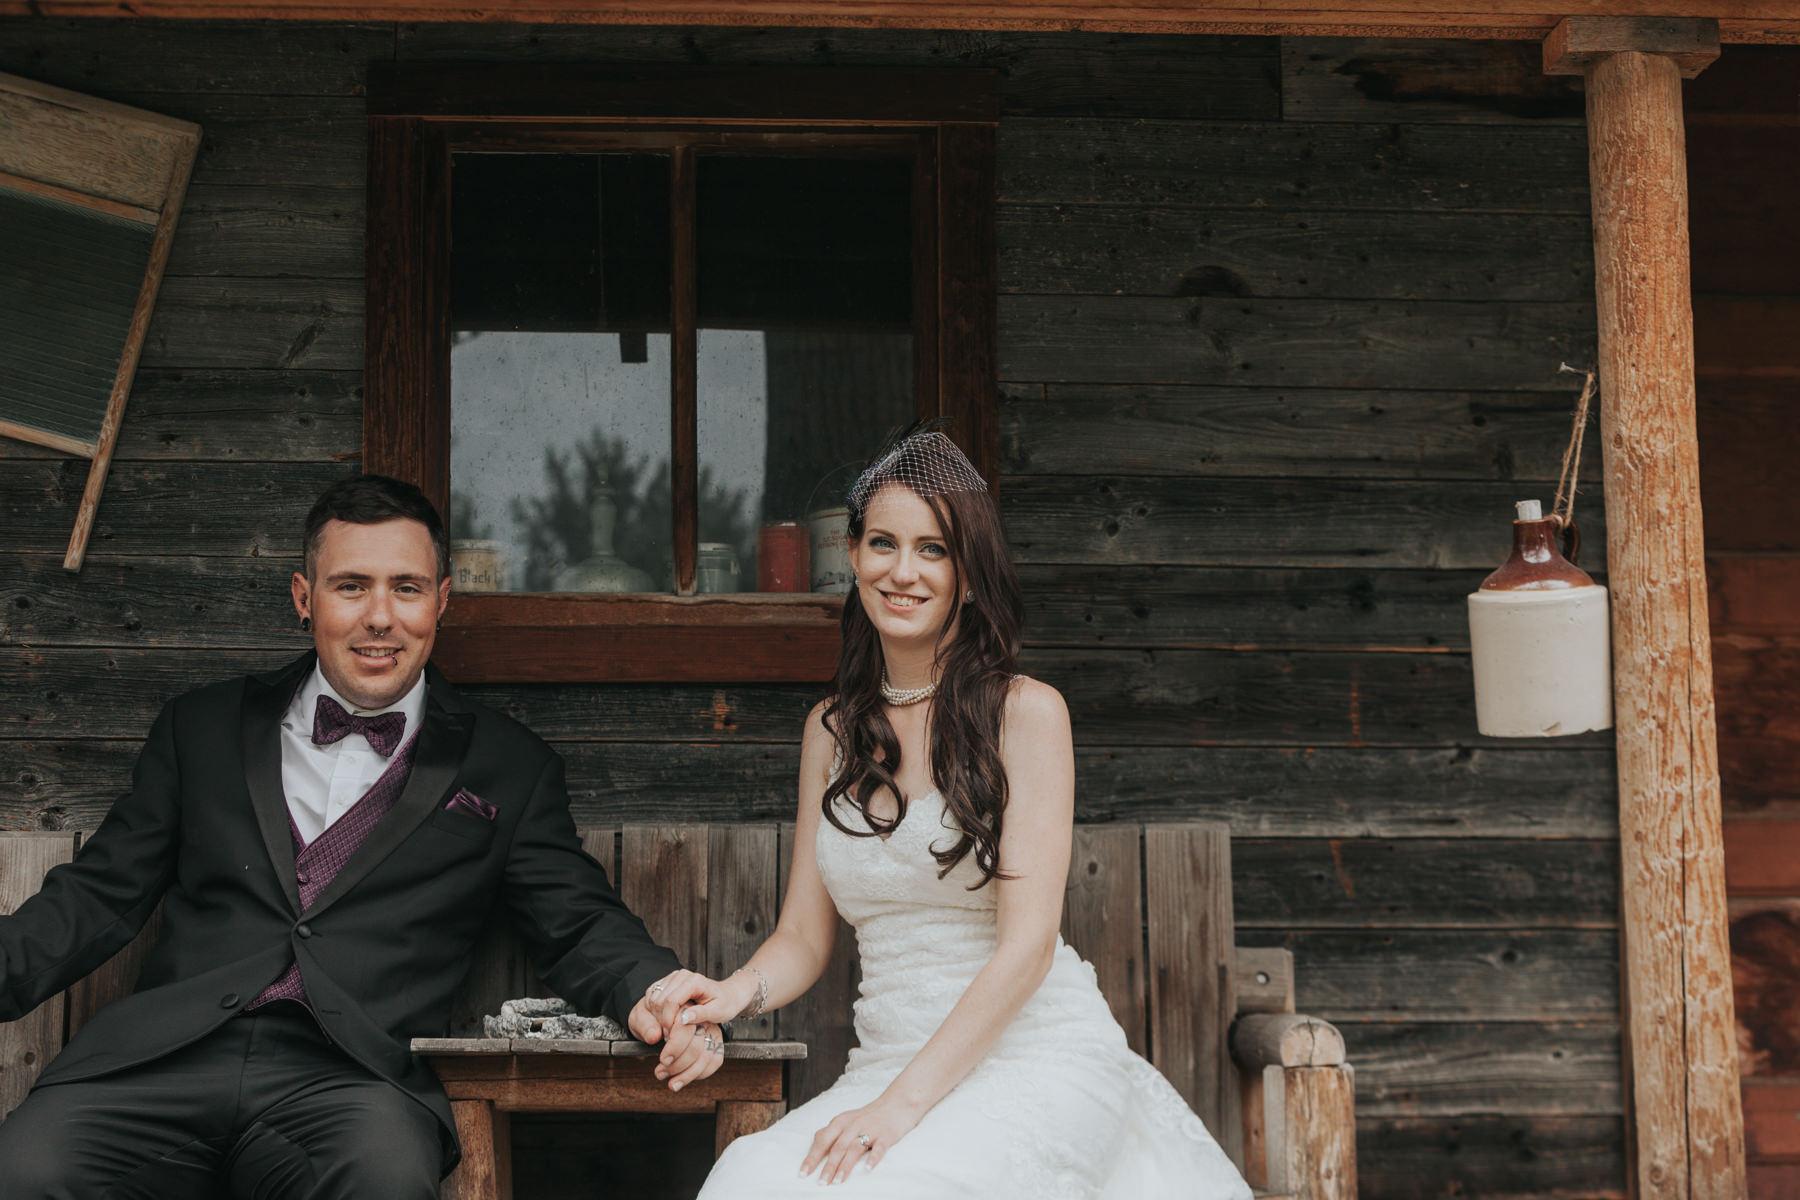 Vancouver Wedding Photographer Pam (48).jpg